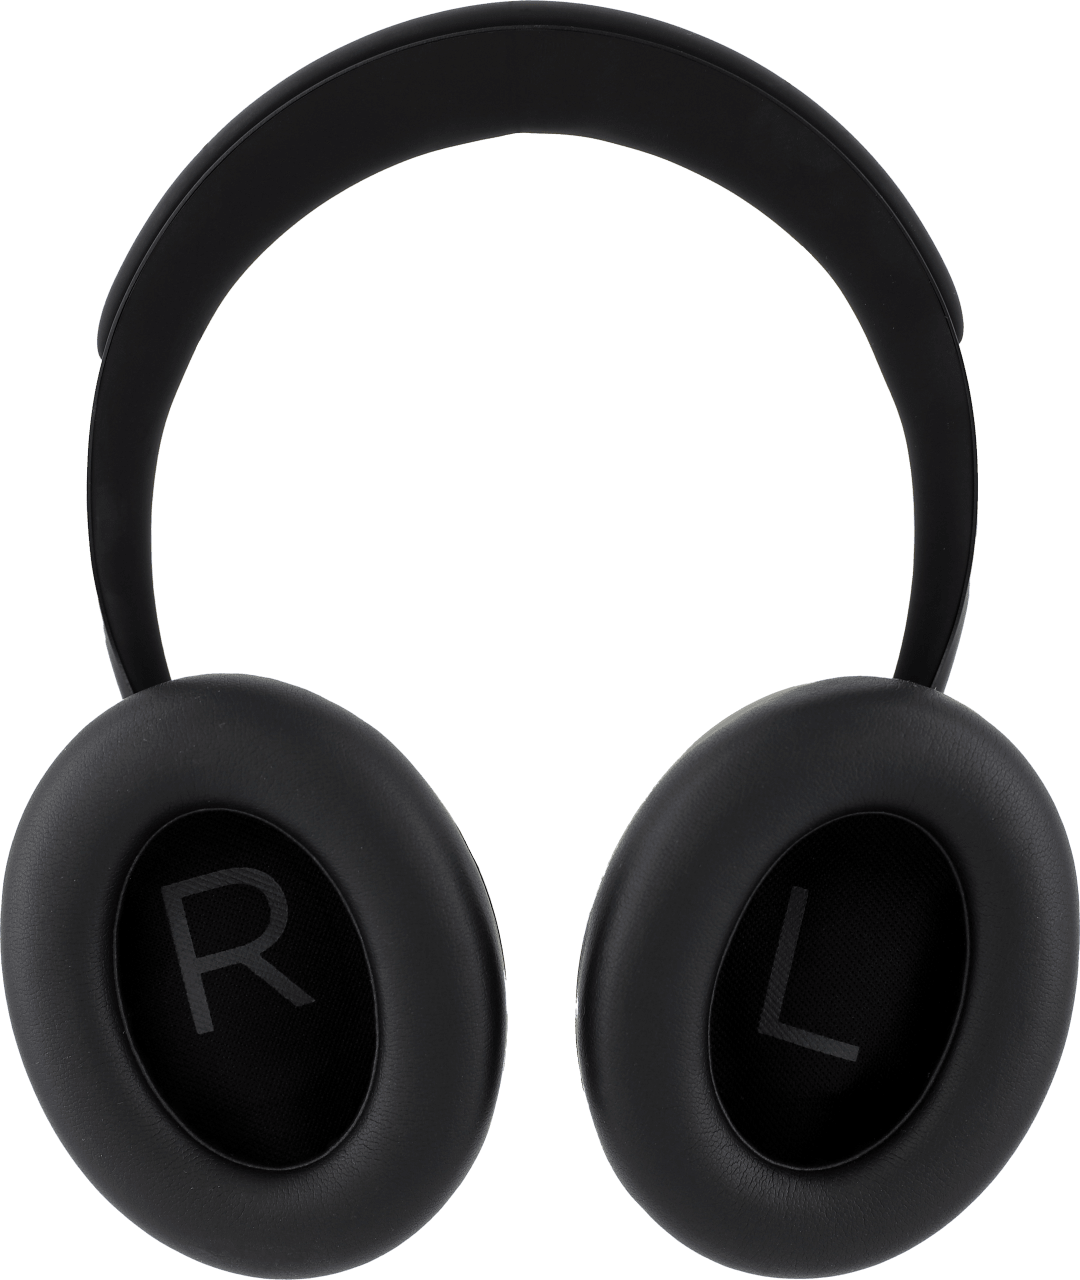 Black Bose 700 Over-ear Bluetooth Headphones.4